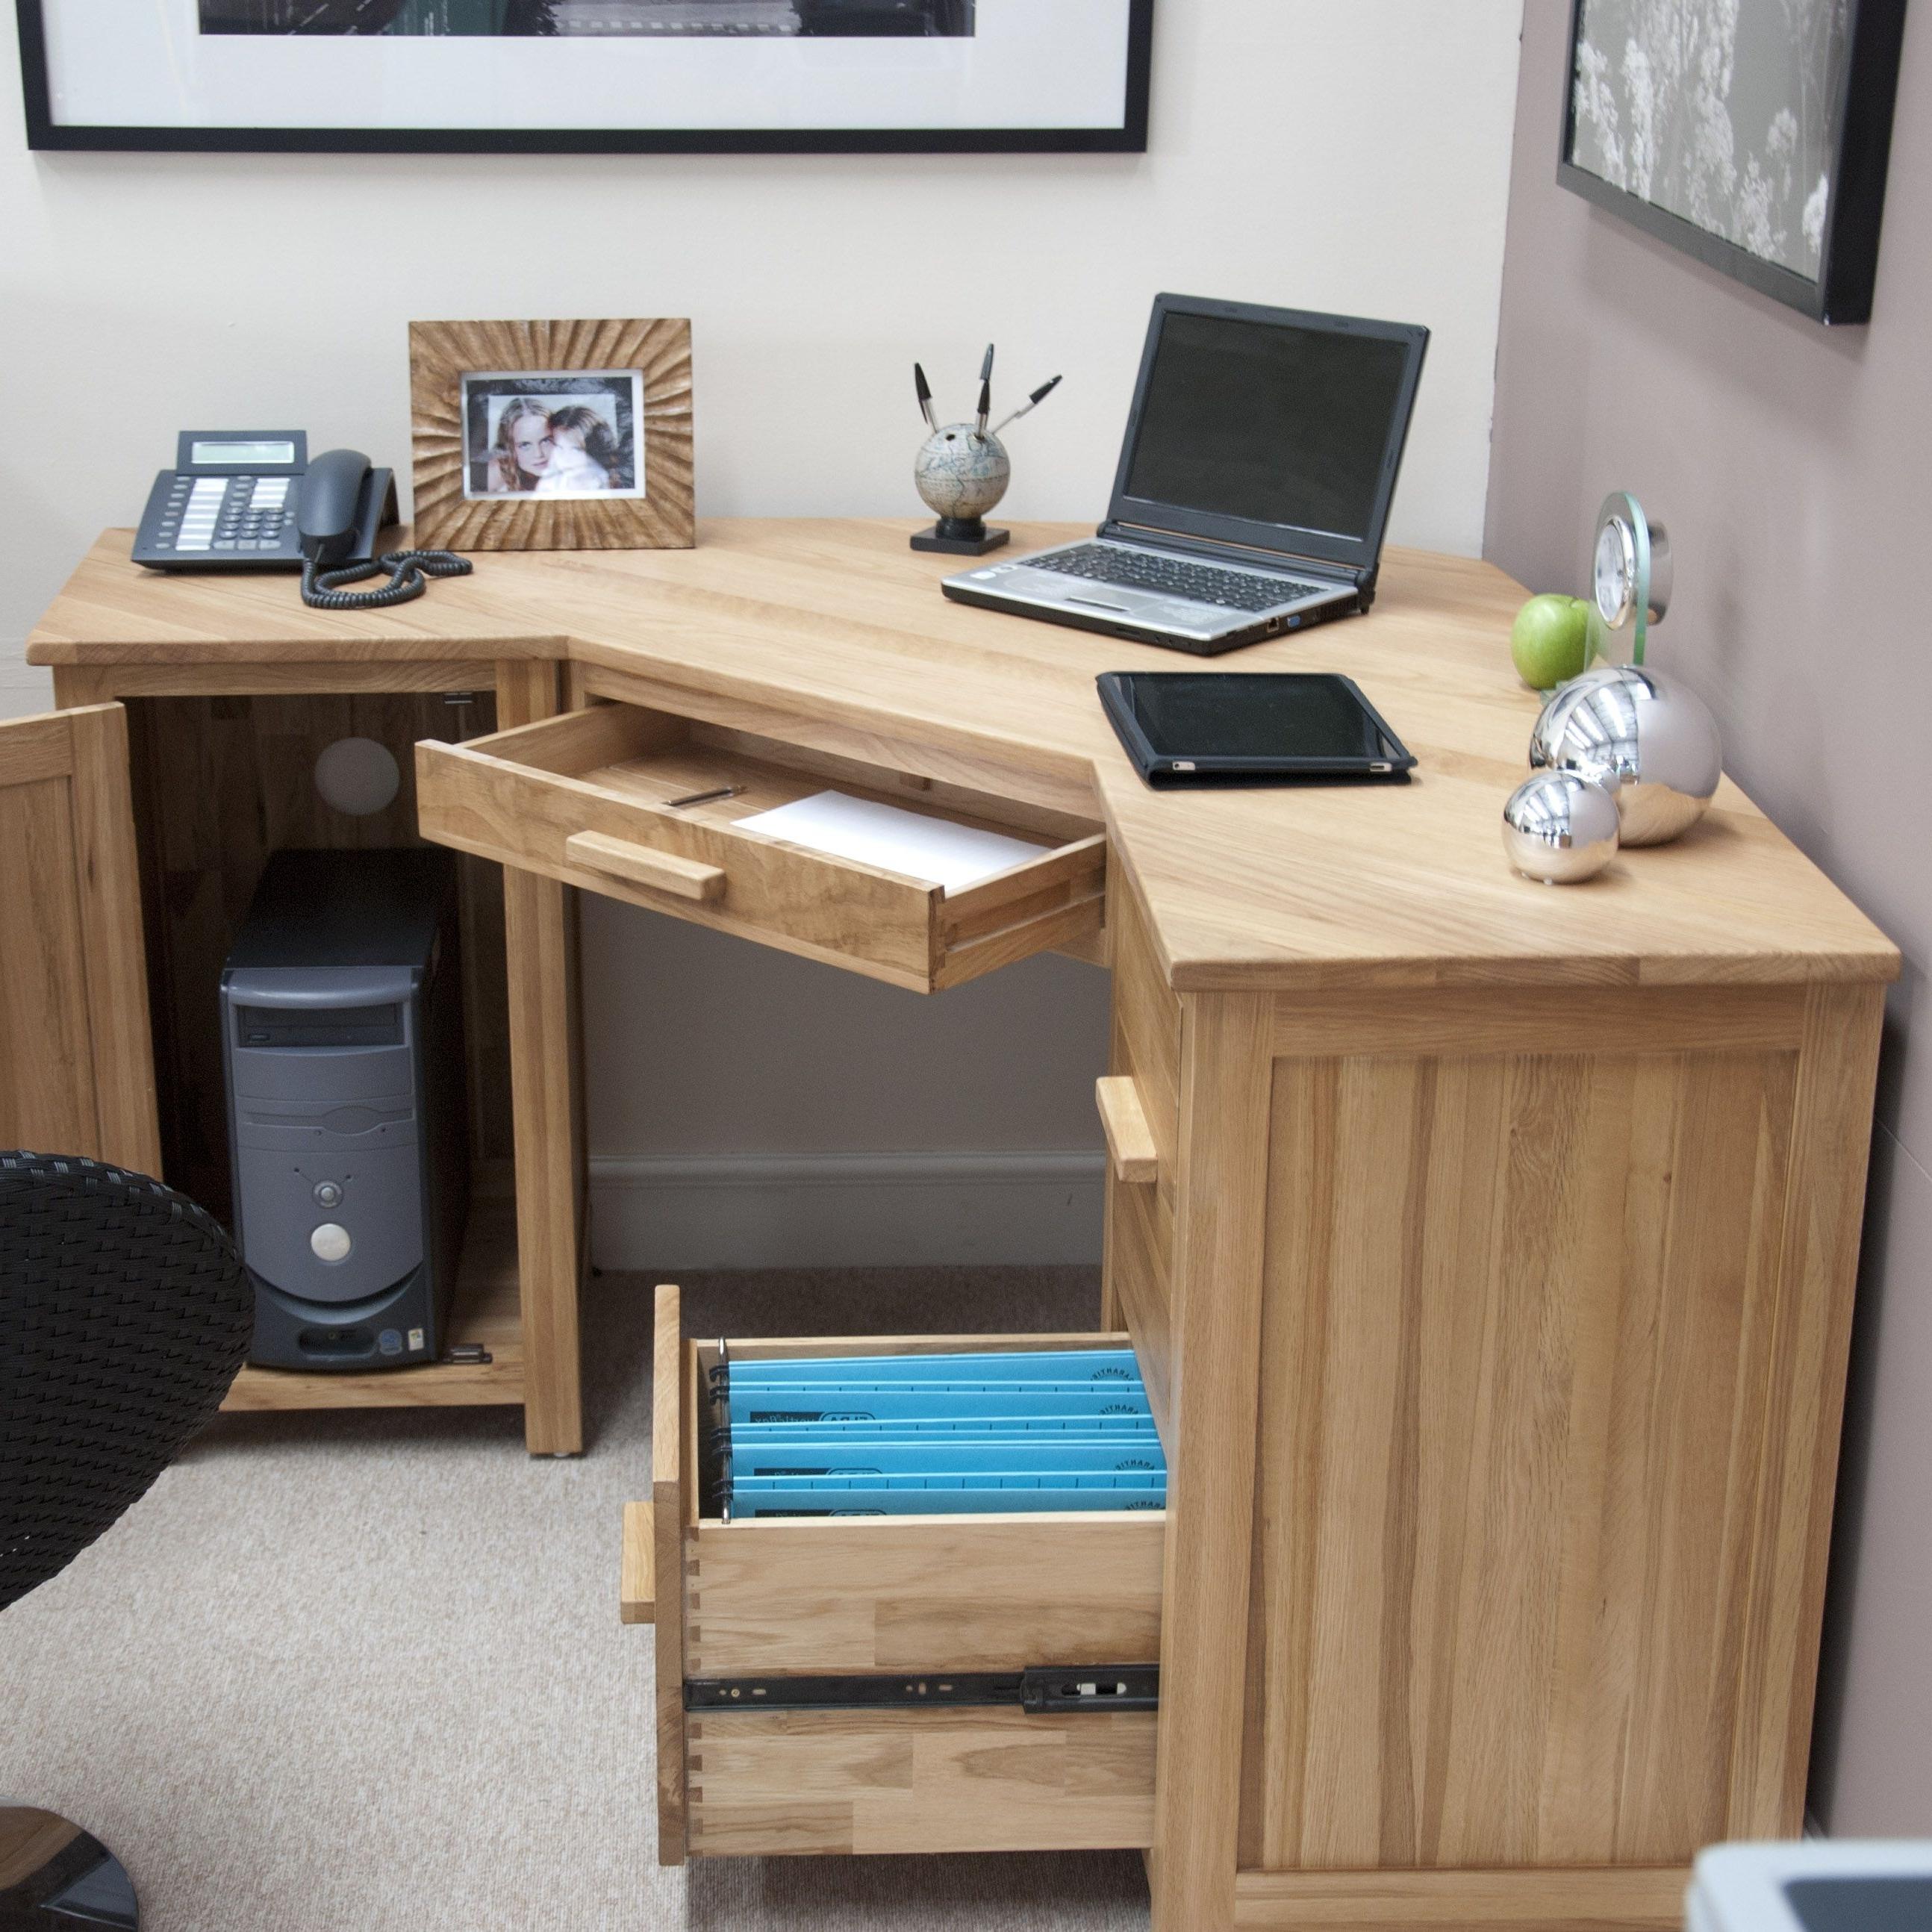 23+ Diy Computer Desk Ideas That Make More Spirit Work (View 13 of 20)